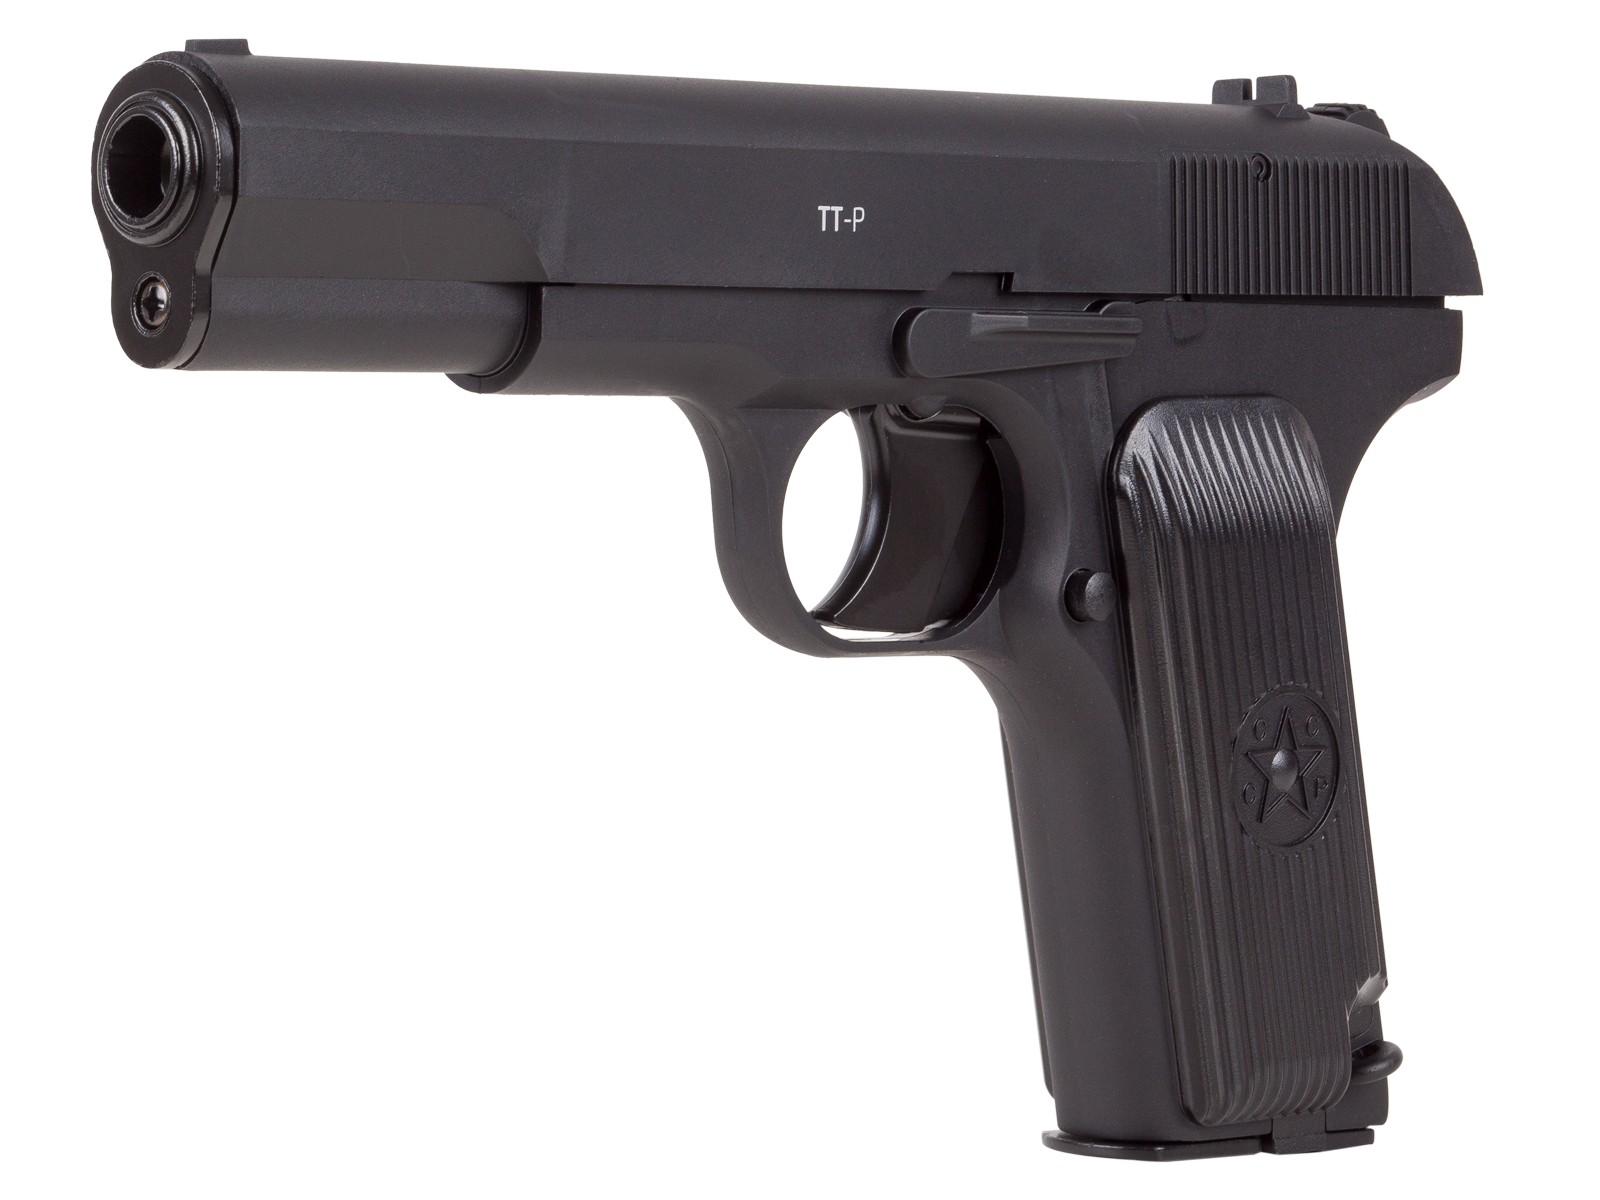 Gletcher TT-P .177 CO2 BB Pistol 0.177